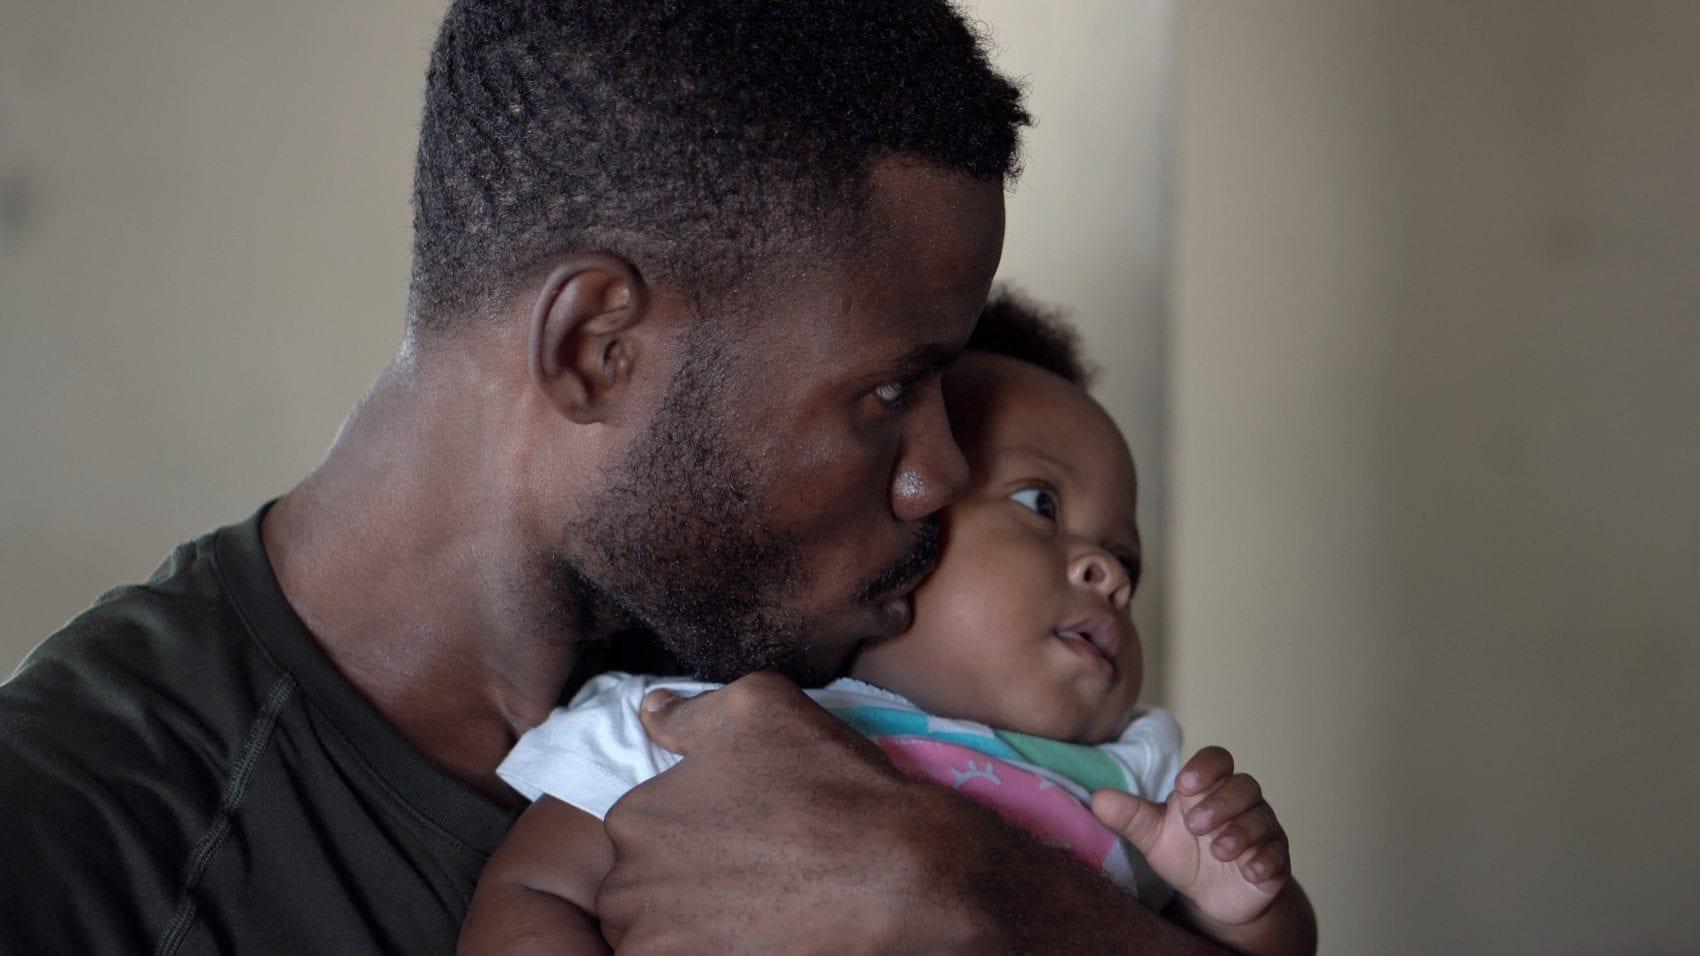 GSK Makes Easier to Swallow HIV Drug for Children